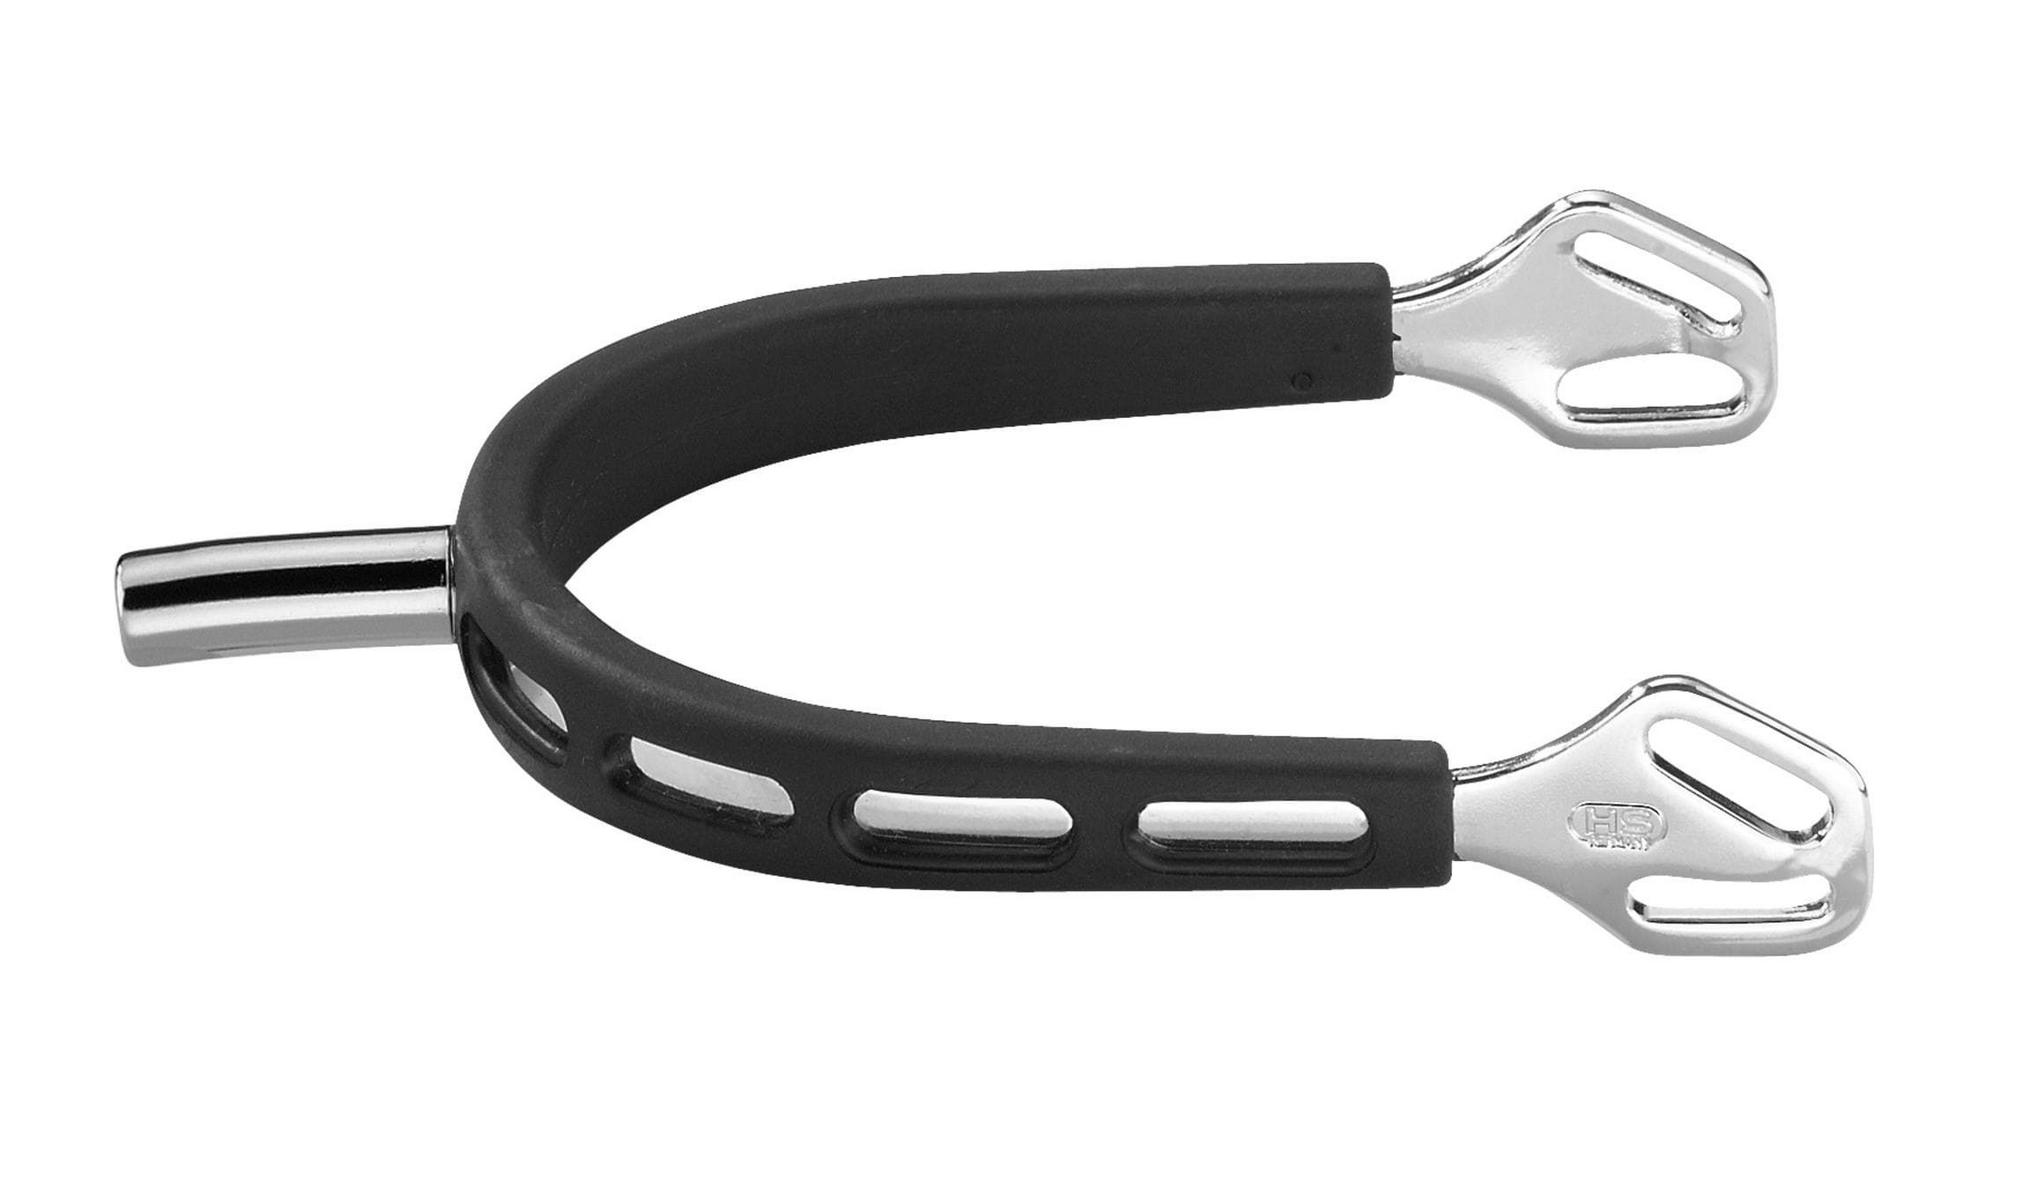 Herm Sprenger Herm Sprenger Ultra Fit Extra Grip 25 mm Flat Neck Stainless Steel  Spurs